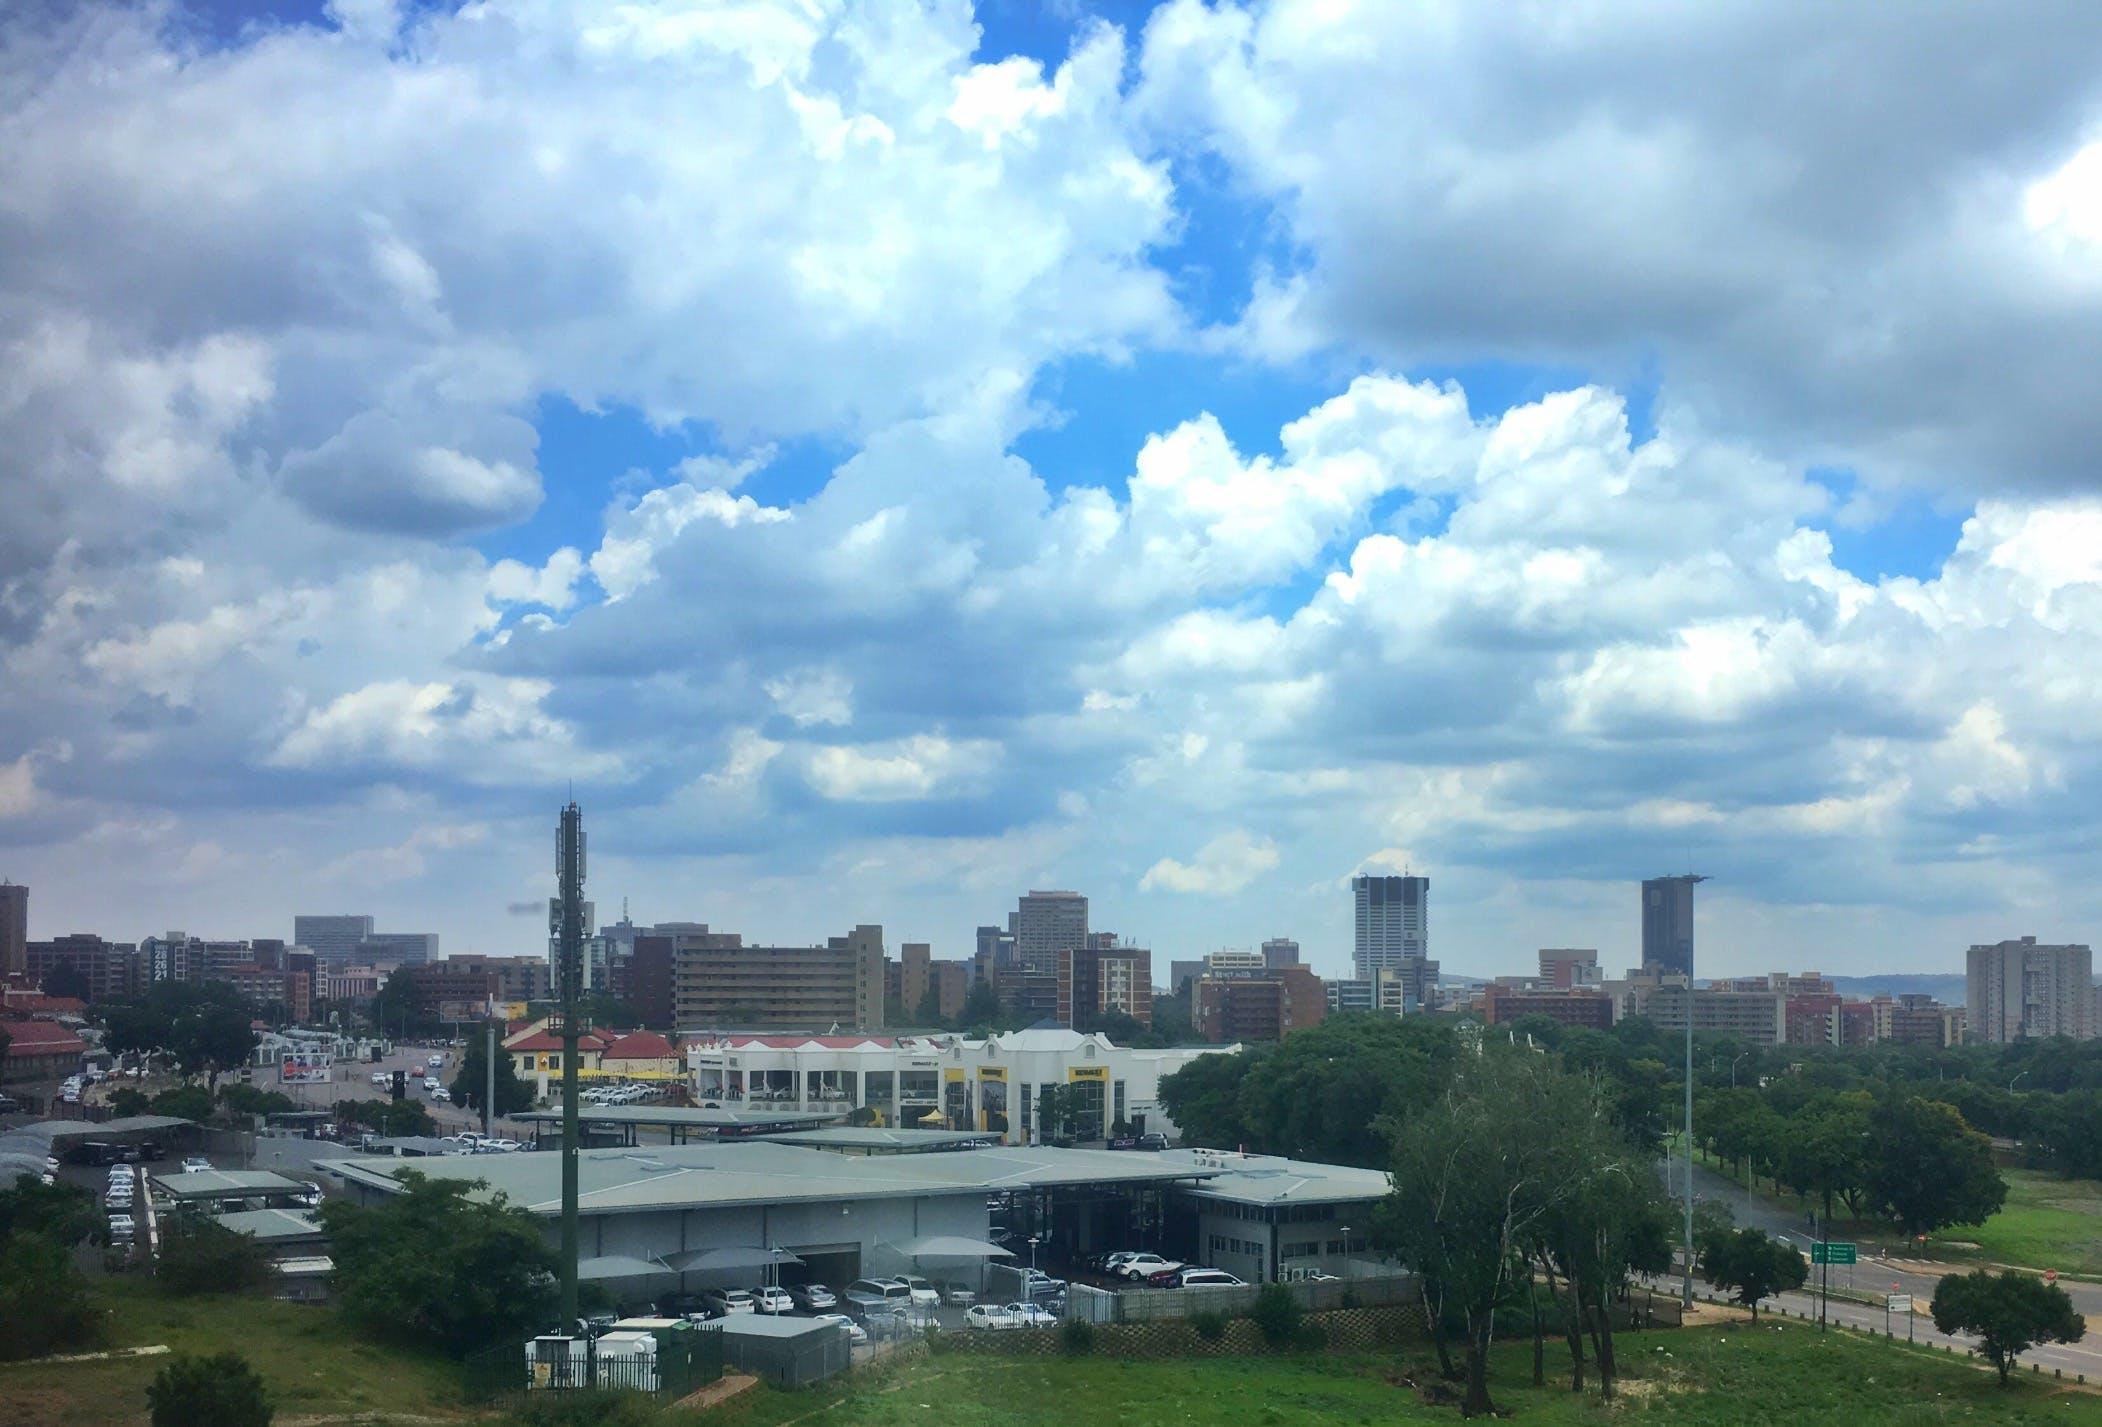 africa, city, clouds